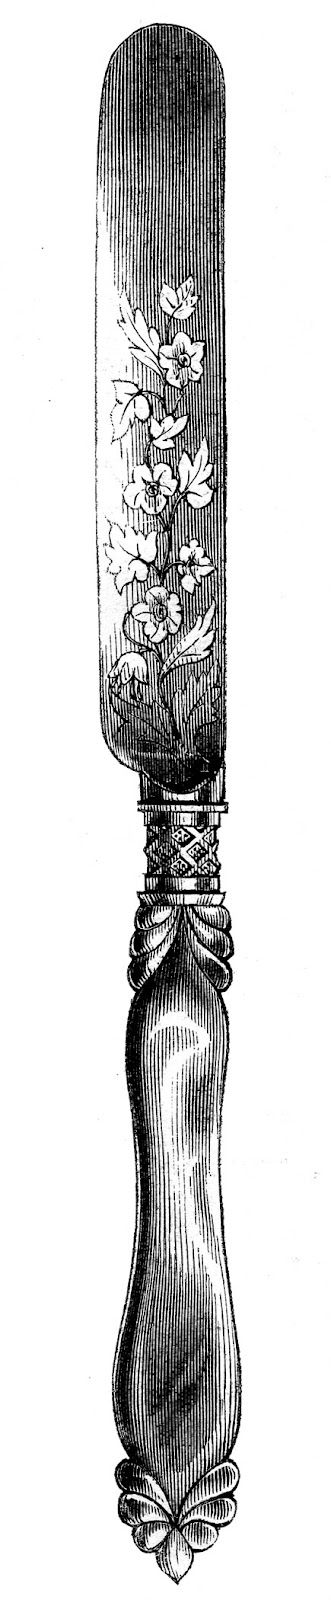 *The Graphics Fairy LLC*: Vintage Clip Art - Fancy Utensils - Fork Spoon Knife